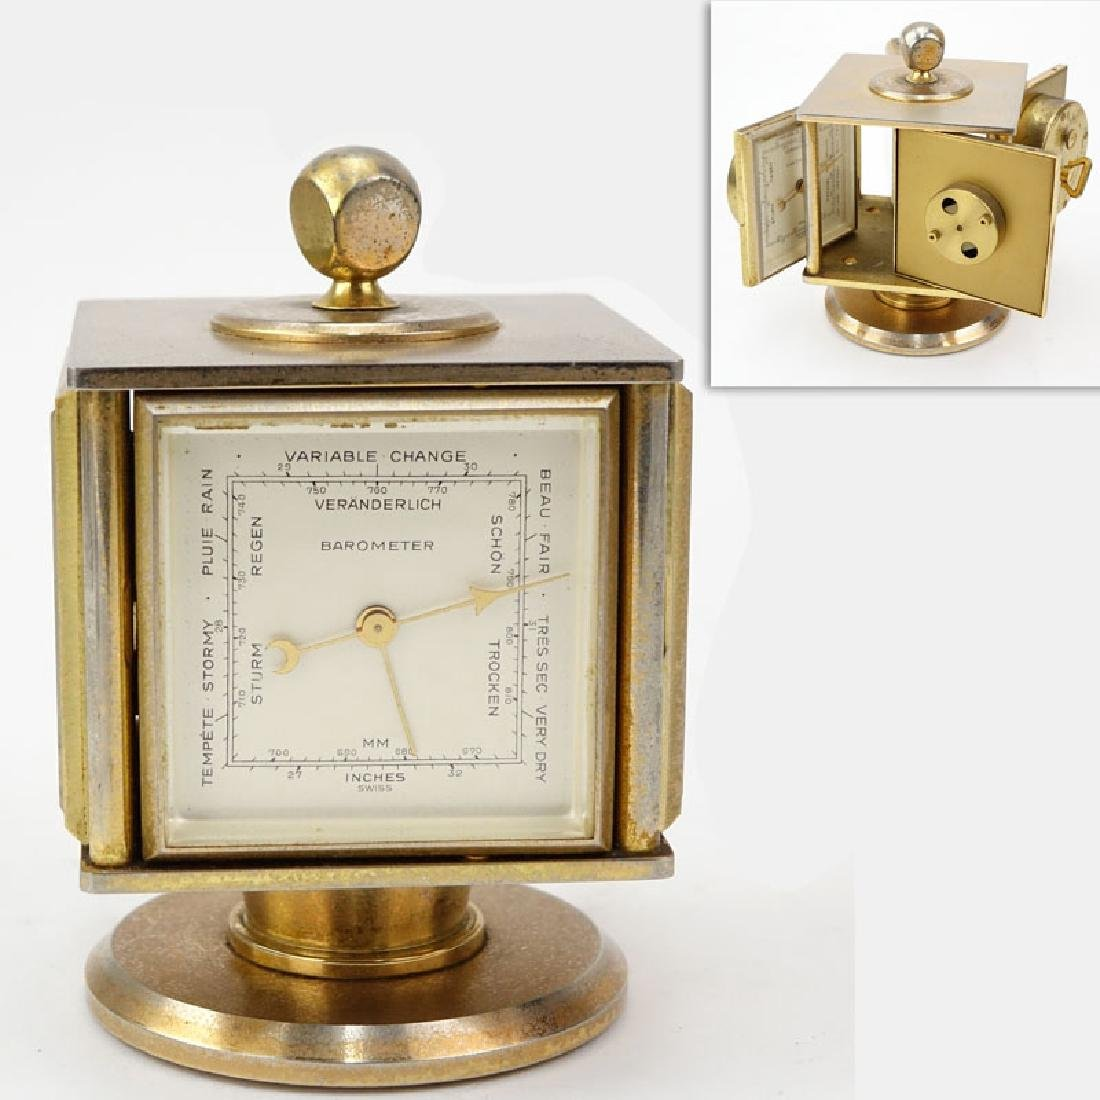 Vintage Bucherer Imhof 4 Sided Art Deco Table Clock.